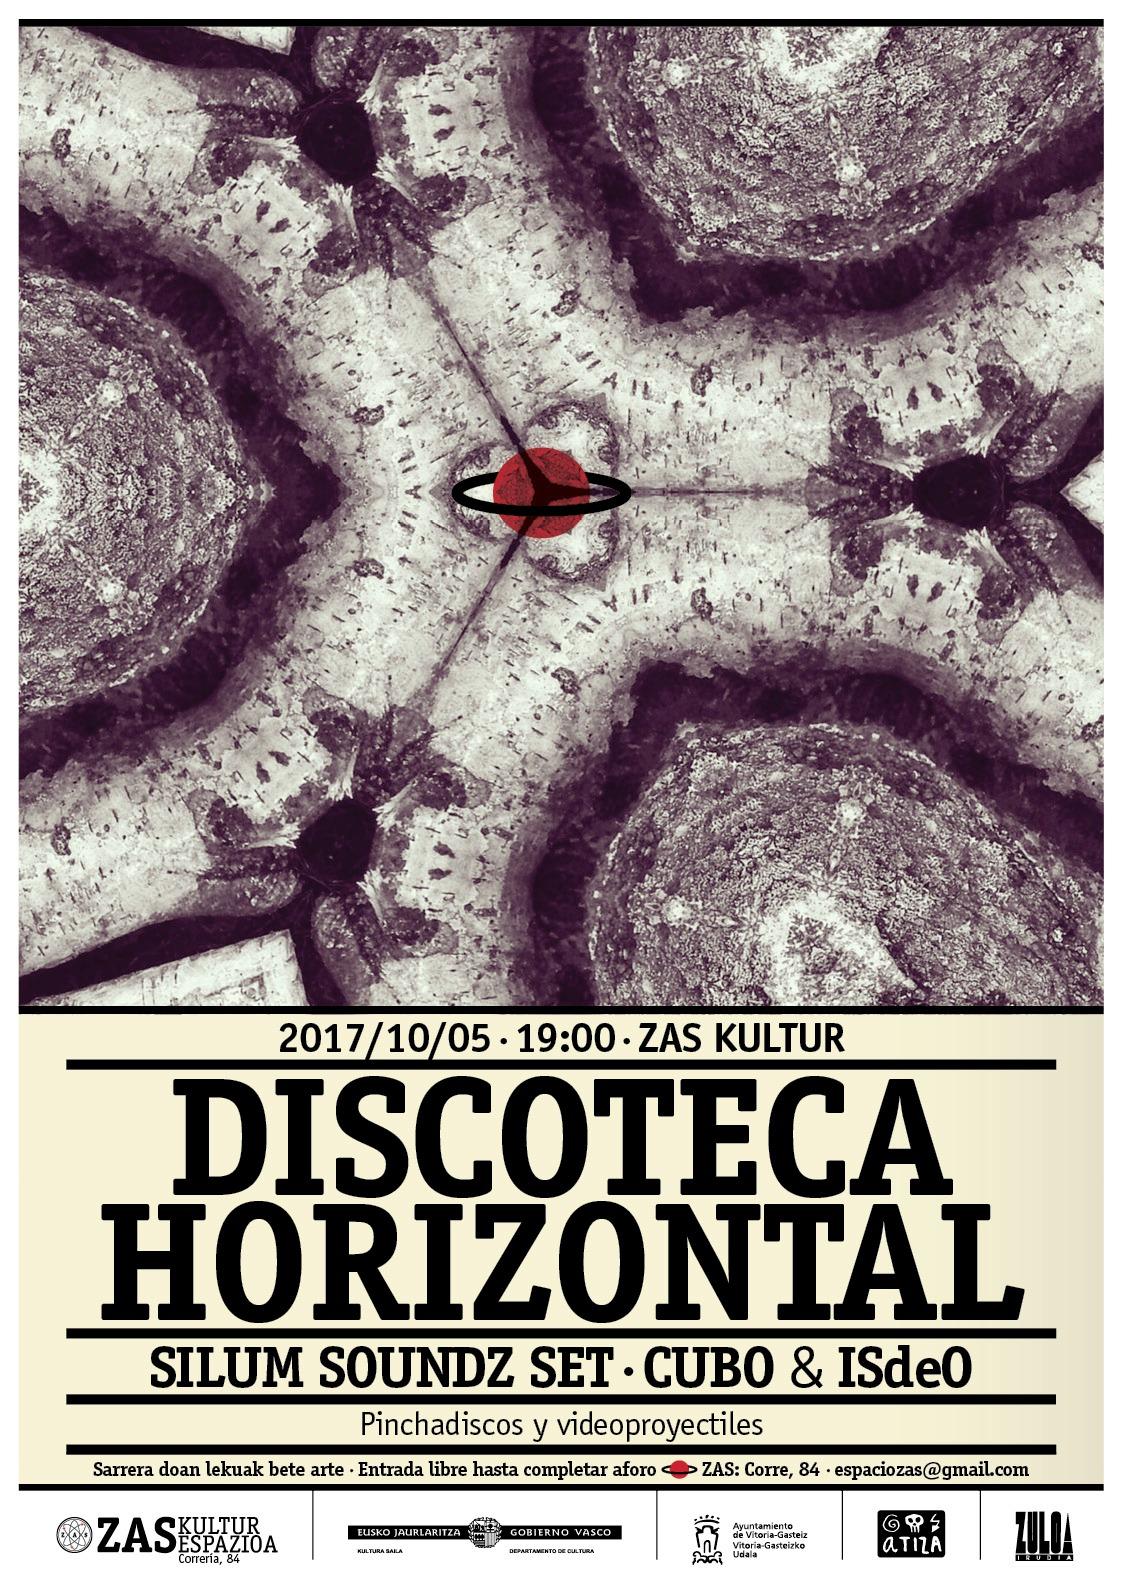 Discoteca Horizontal